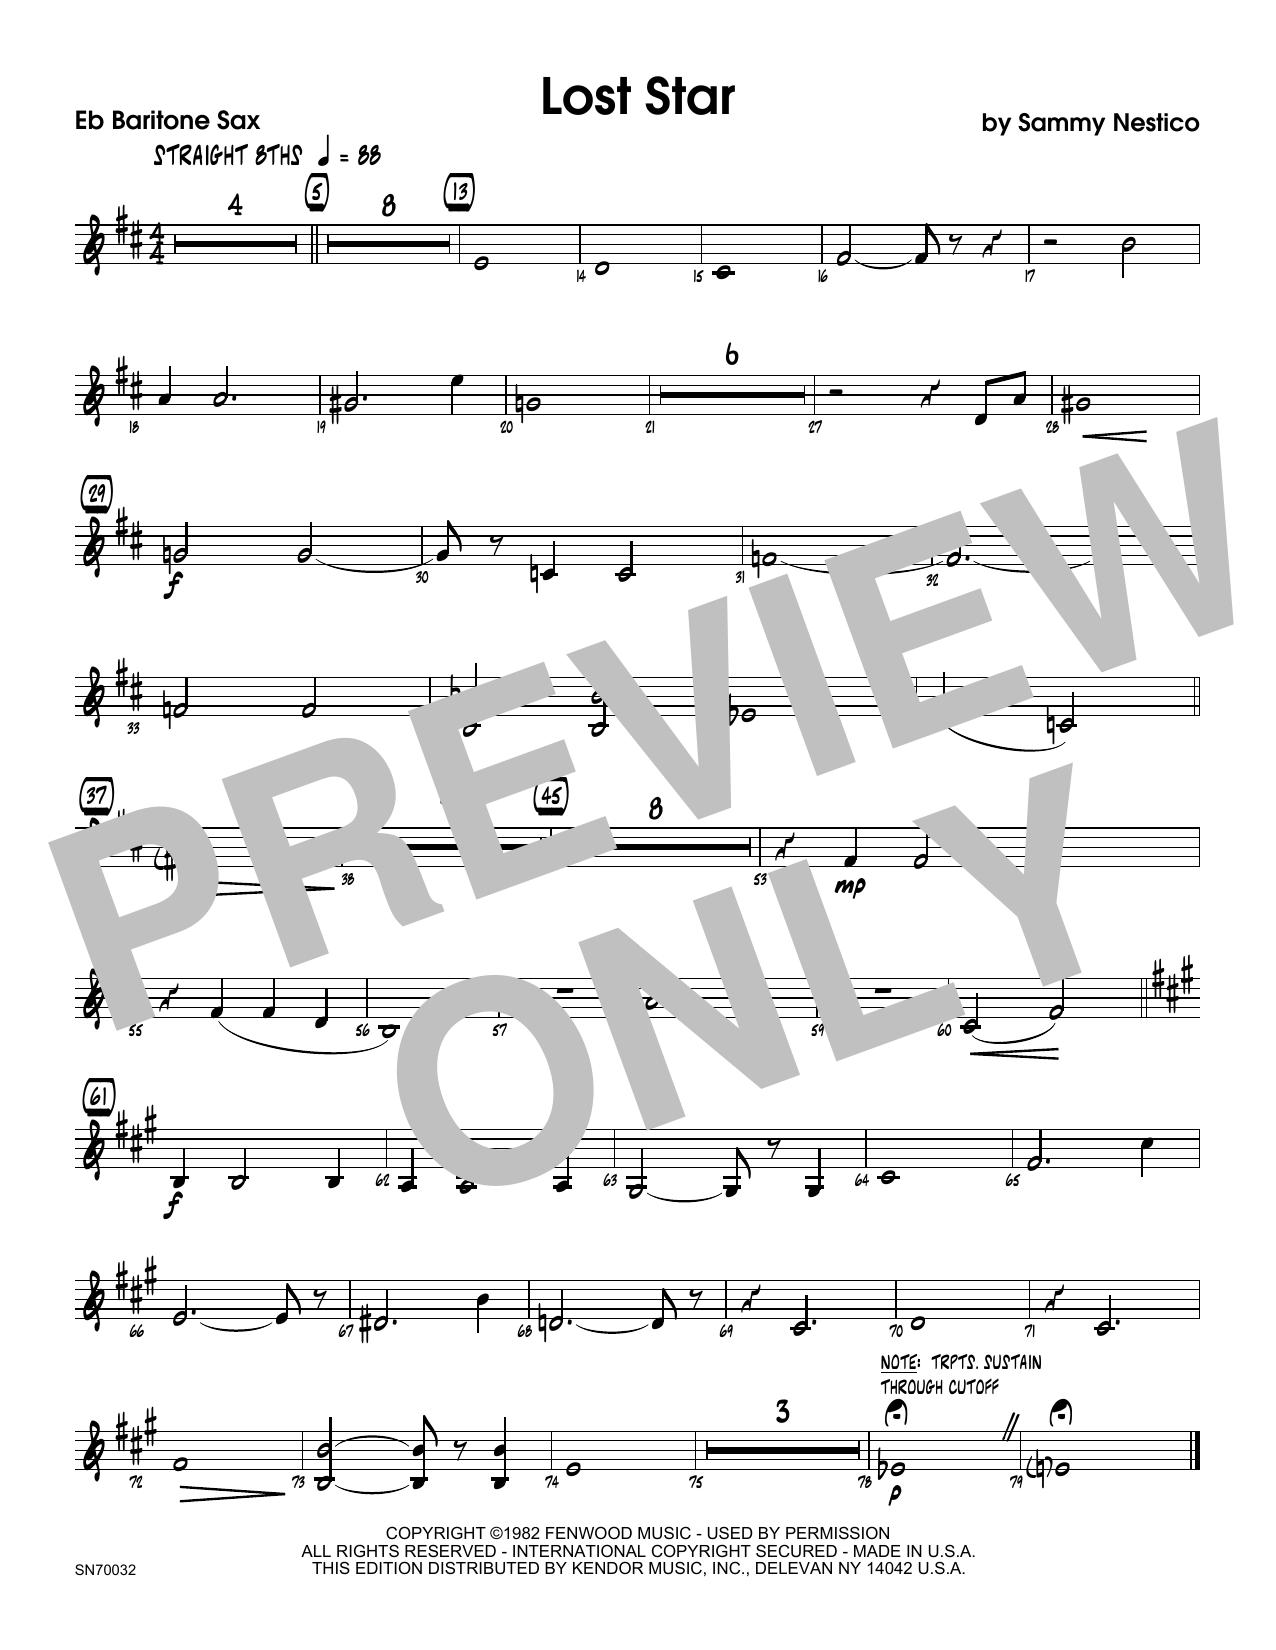 Lost Star - Eb Baritone Saxophone Sheet Music